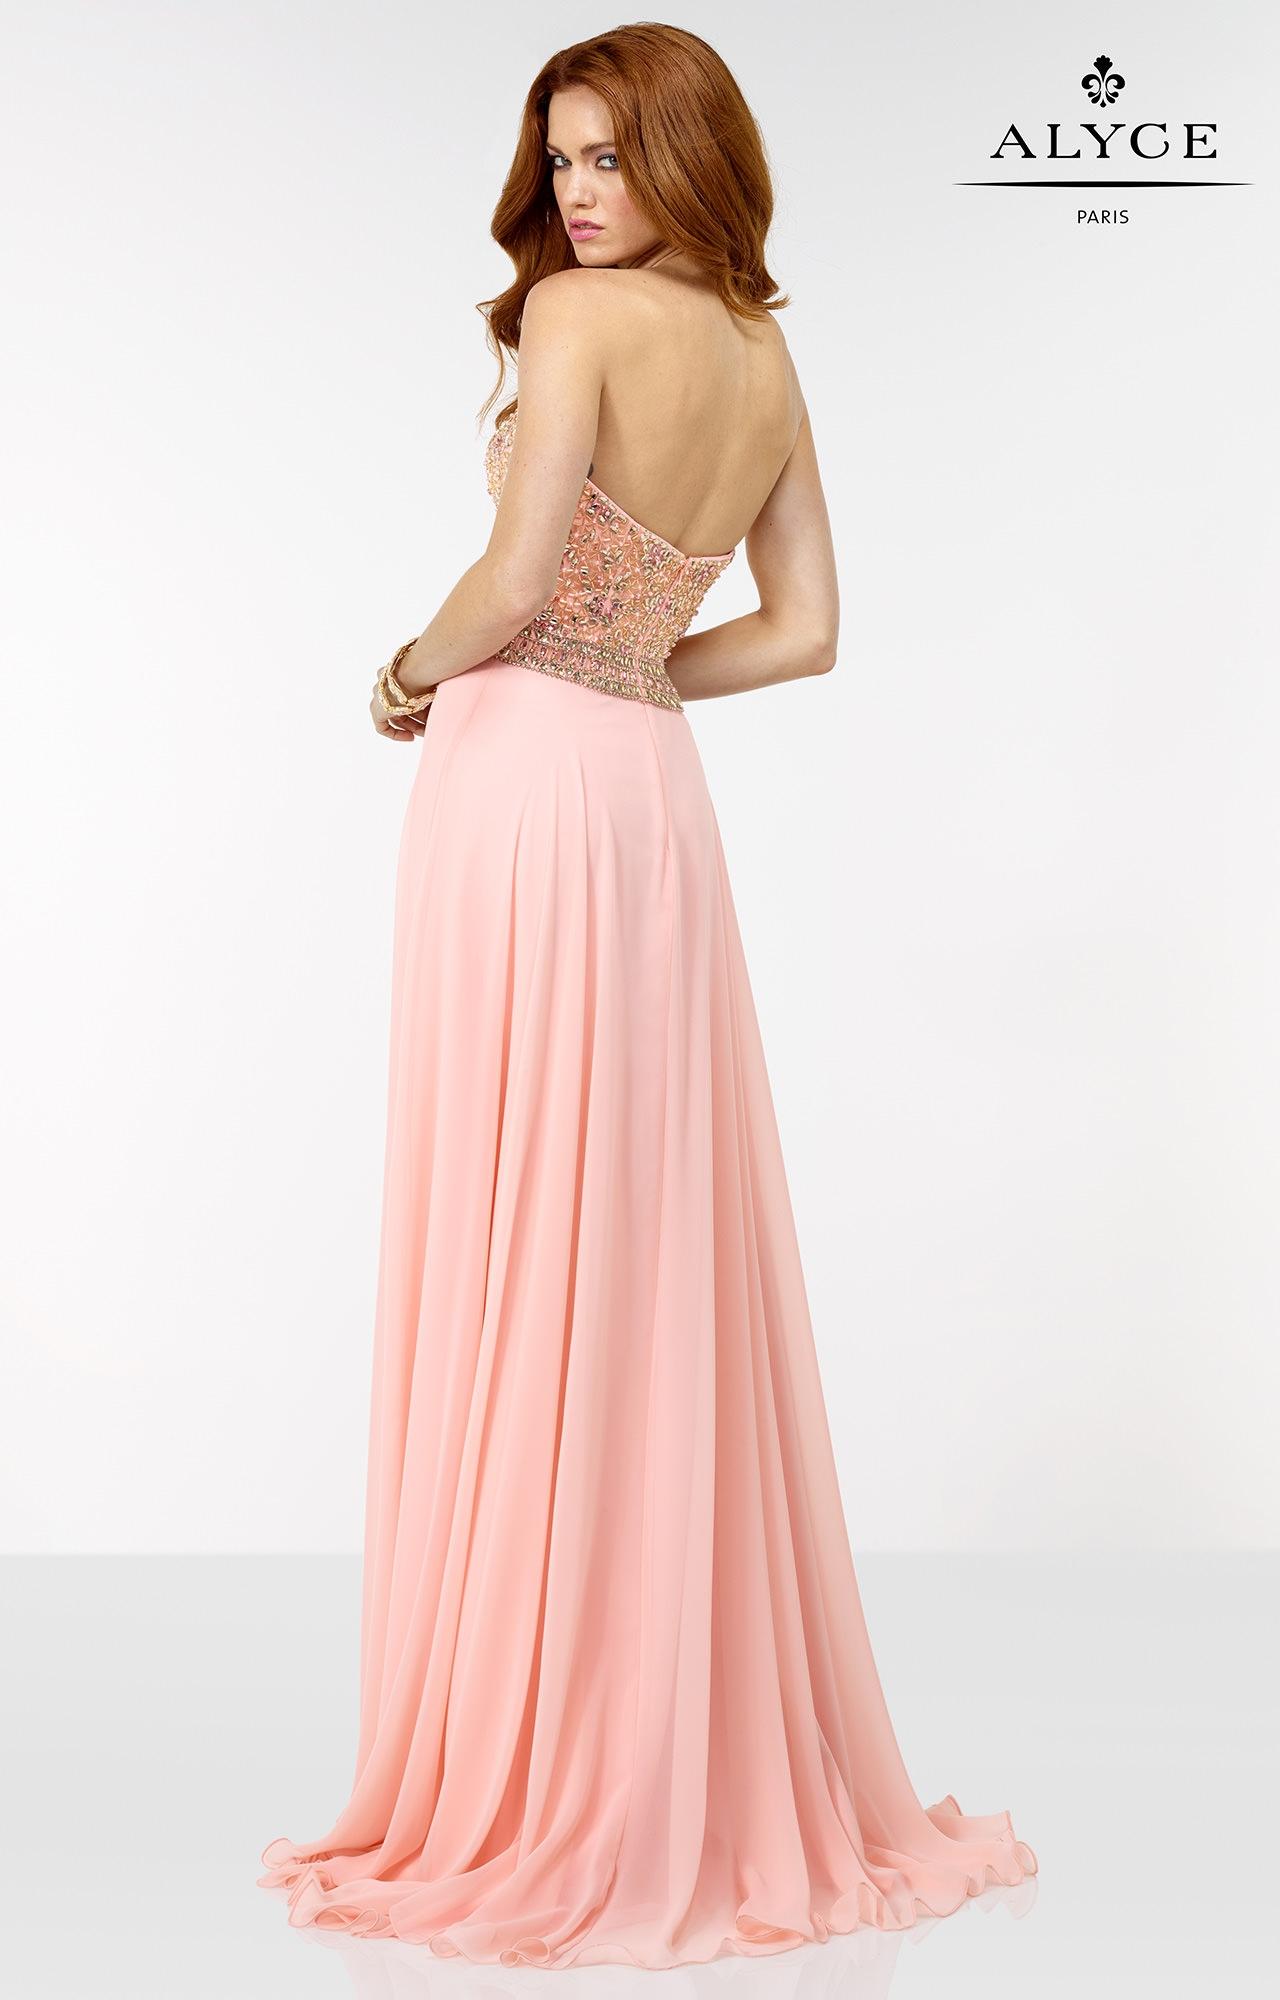 Alyce Paris 6571 - No Looking Back Dress Prom Dress